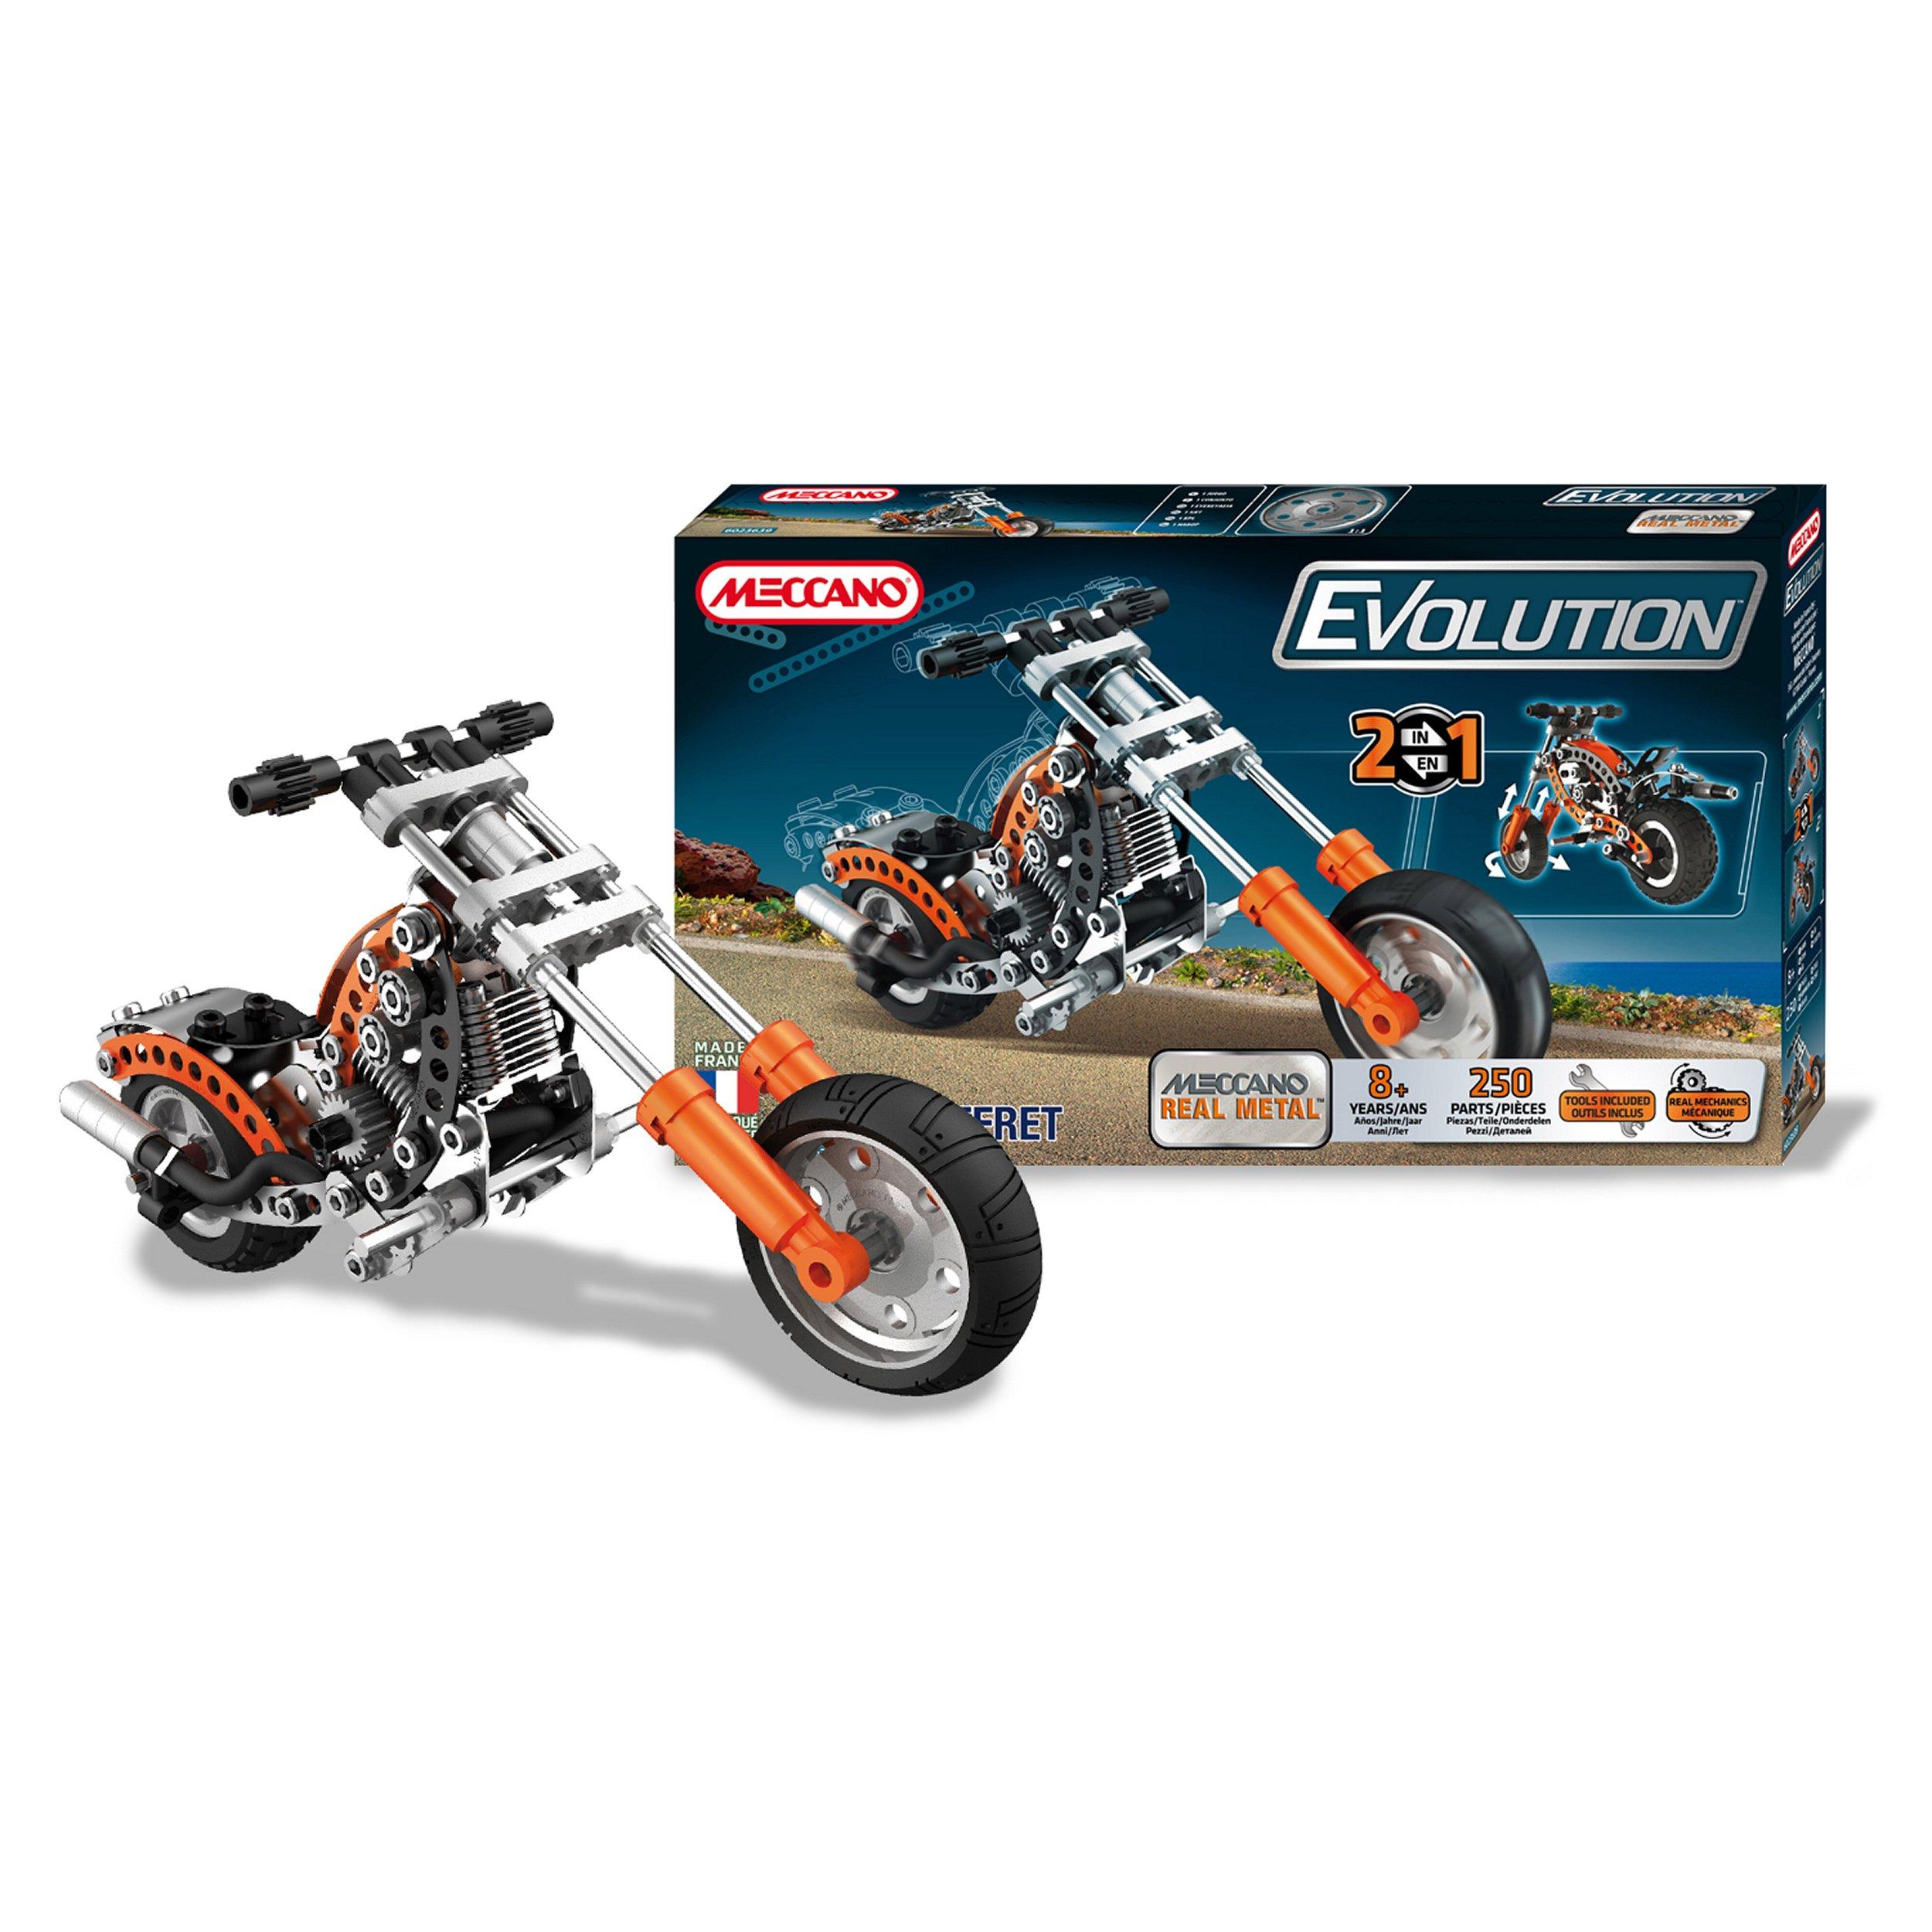 Meccano Evolution Chopper Motorbike